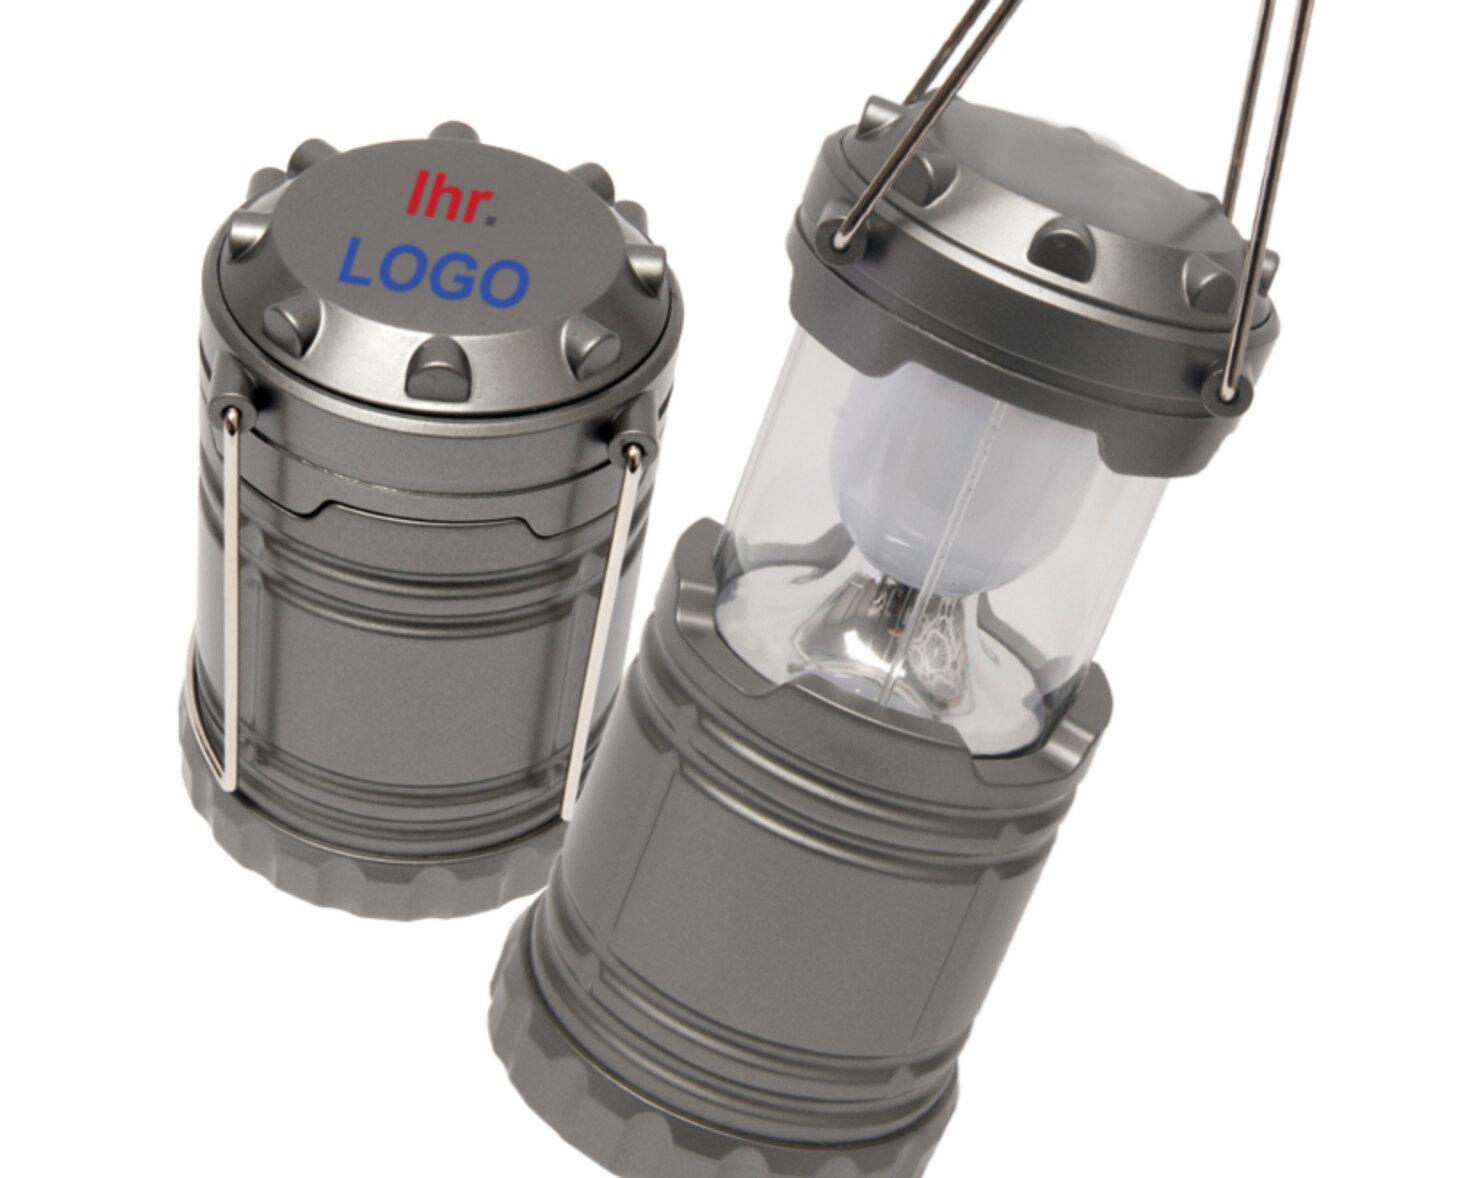 Outdoor LED Lampe als bedrucktes Giveaway